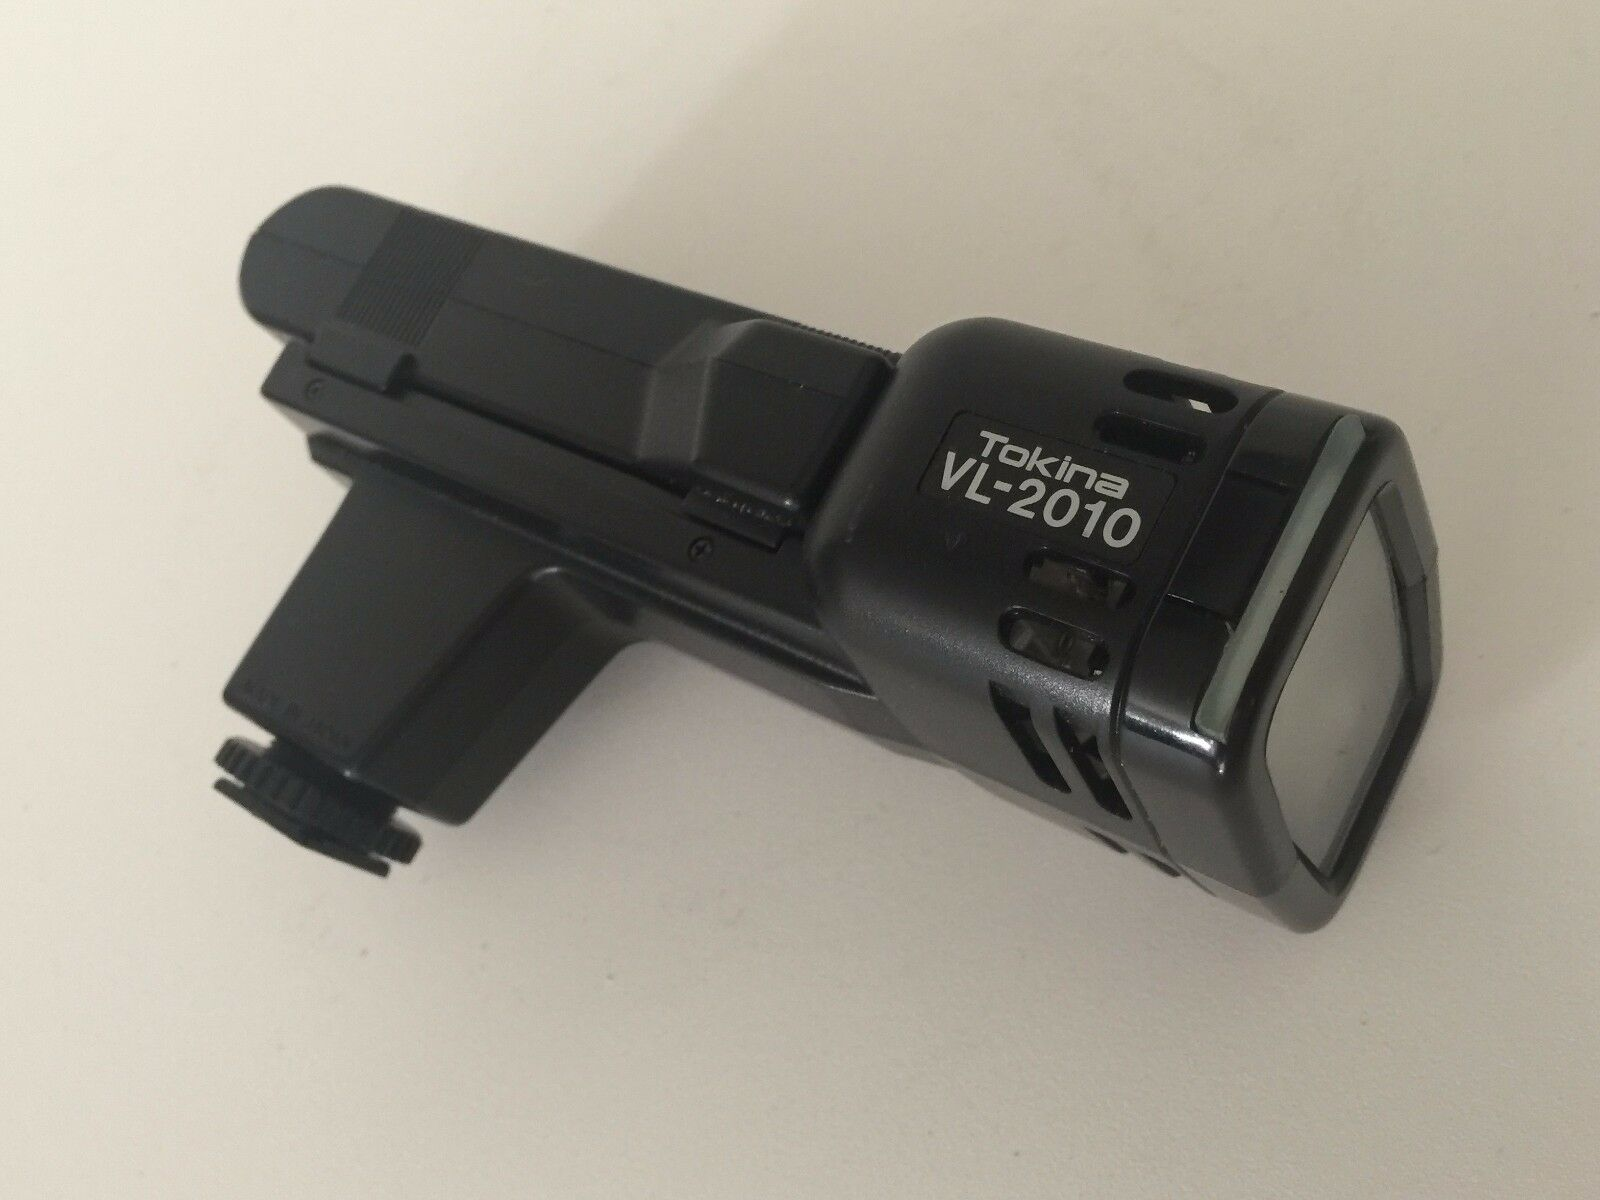 Tokina VL-2010 Potente Flash w/Battery (No Charger)